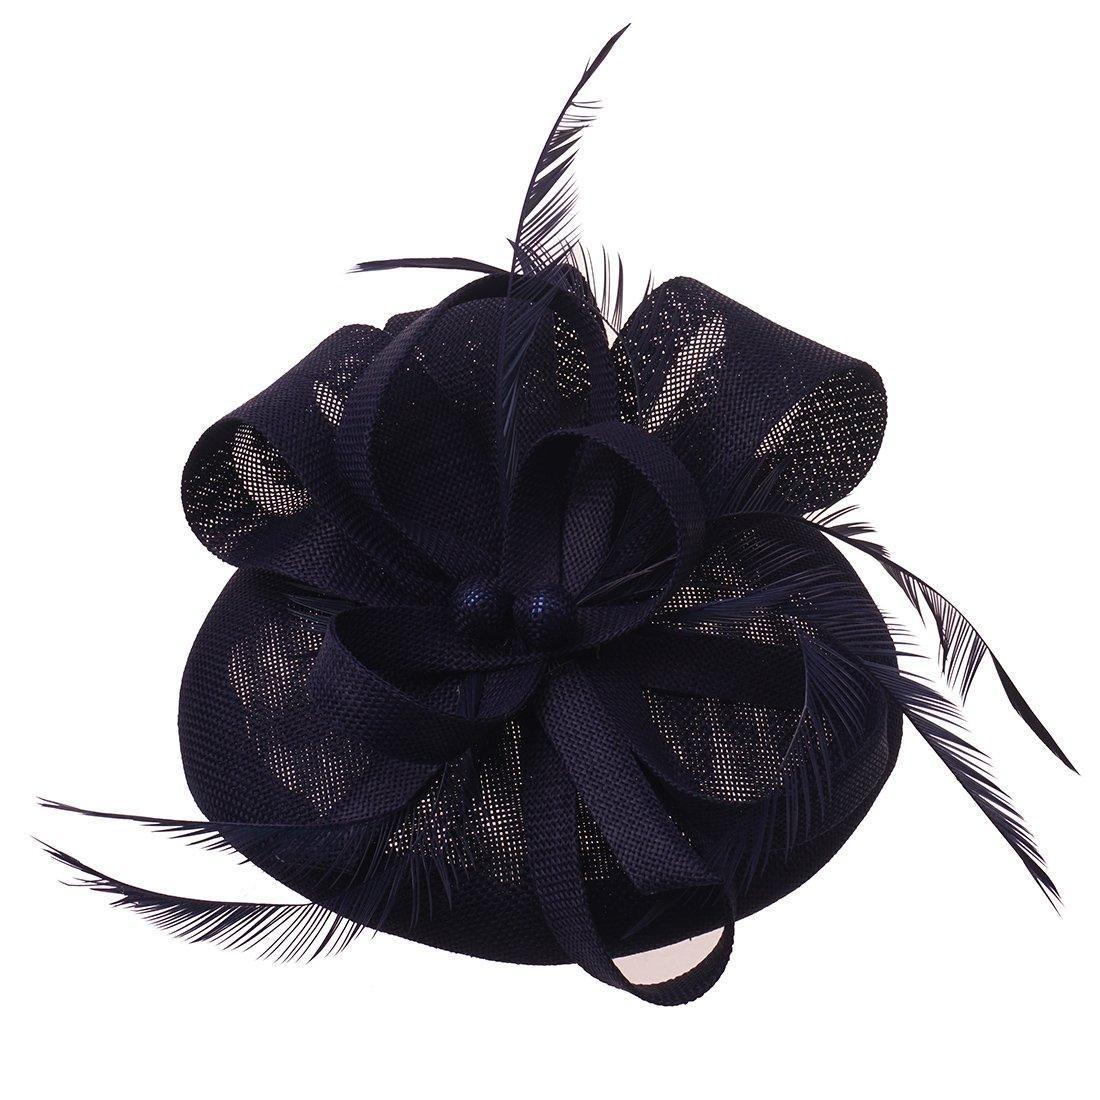 93ce5474923 Fascinator Pillbox Hat Headband Hair Clip For Cocktail Tea Party ...